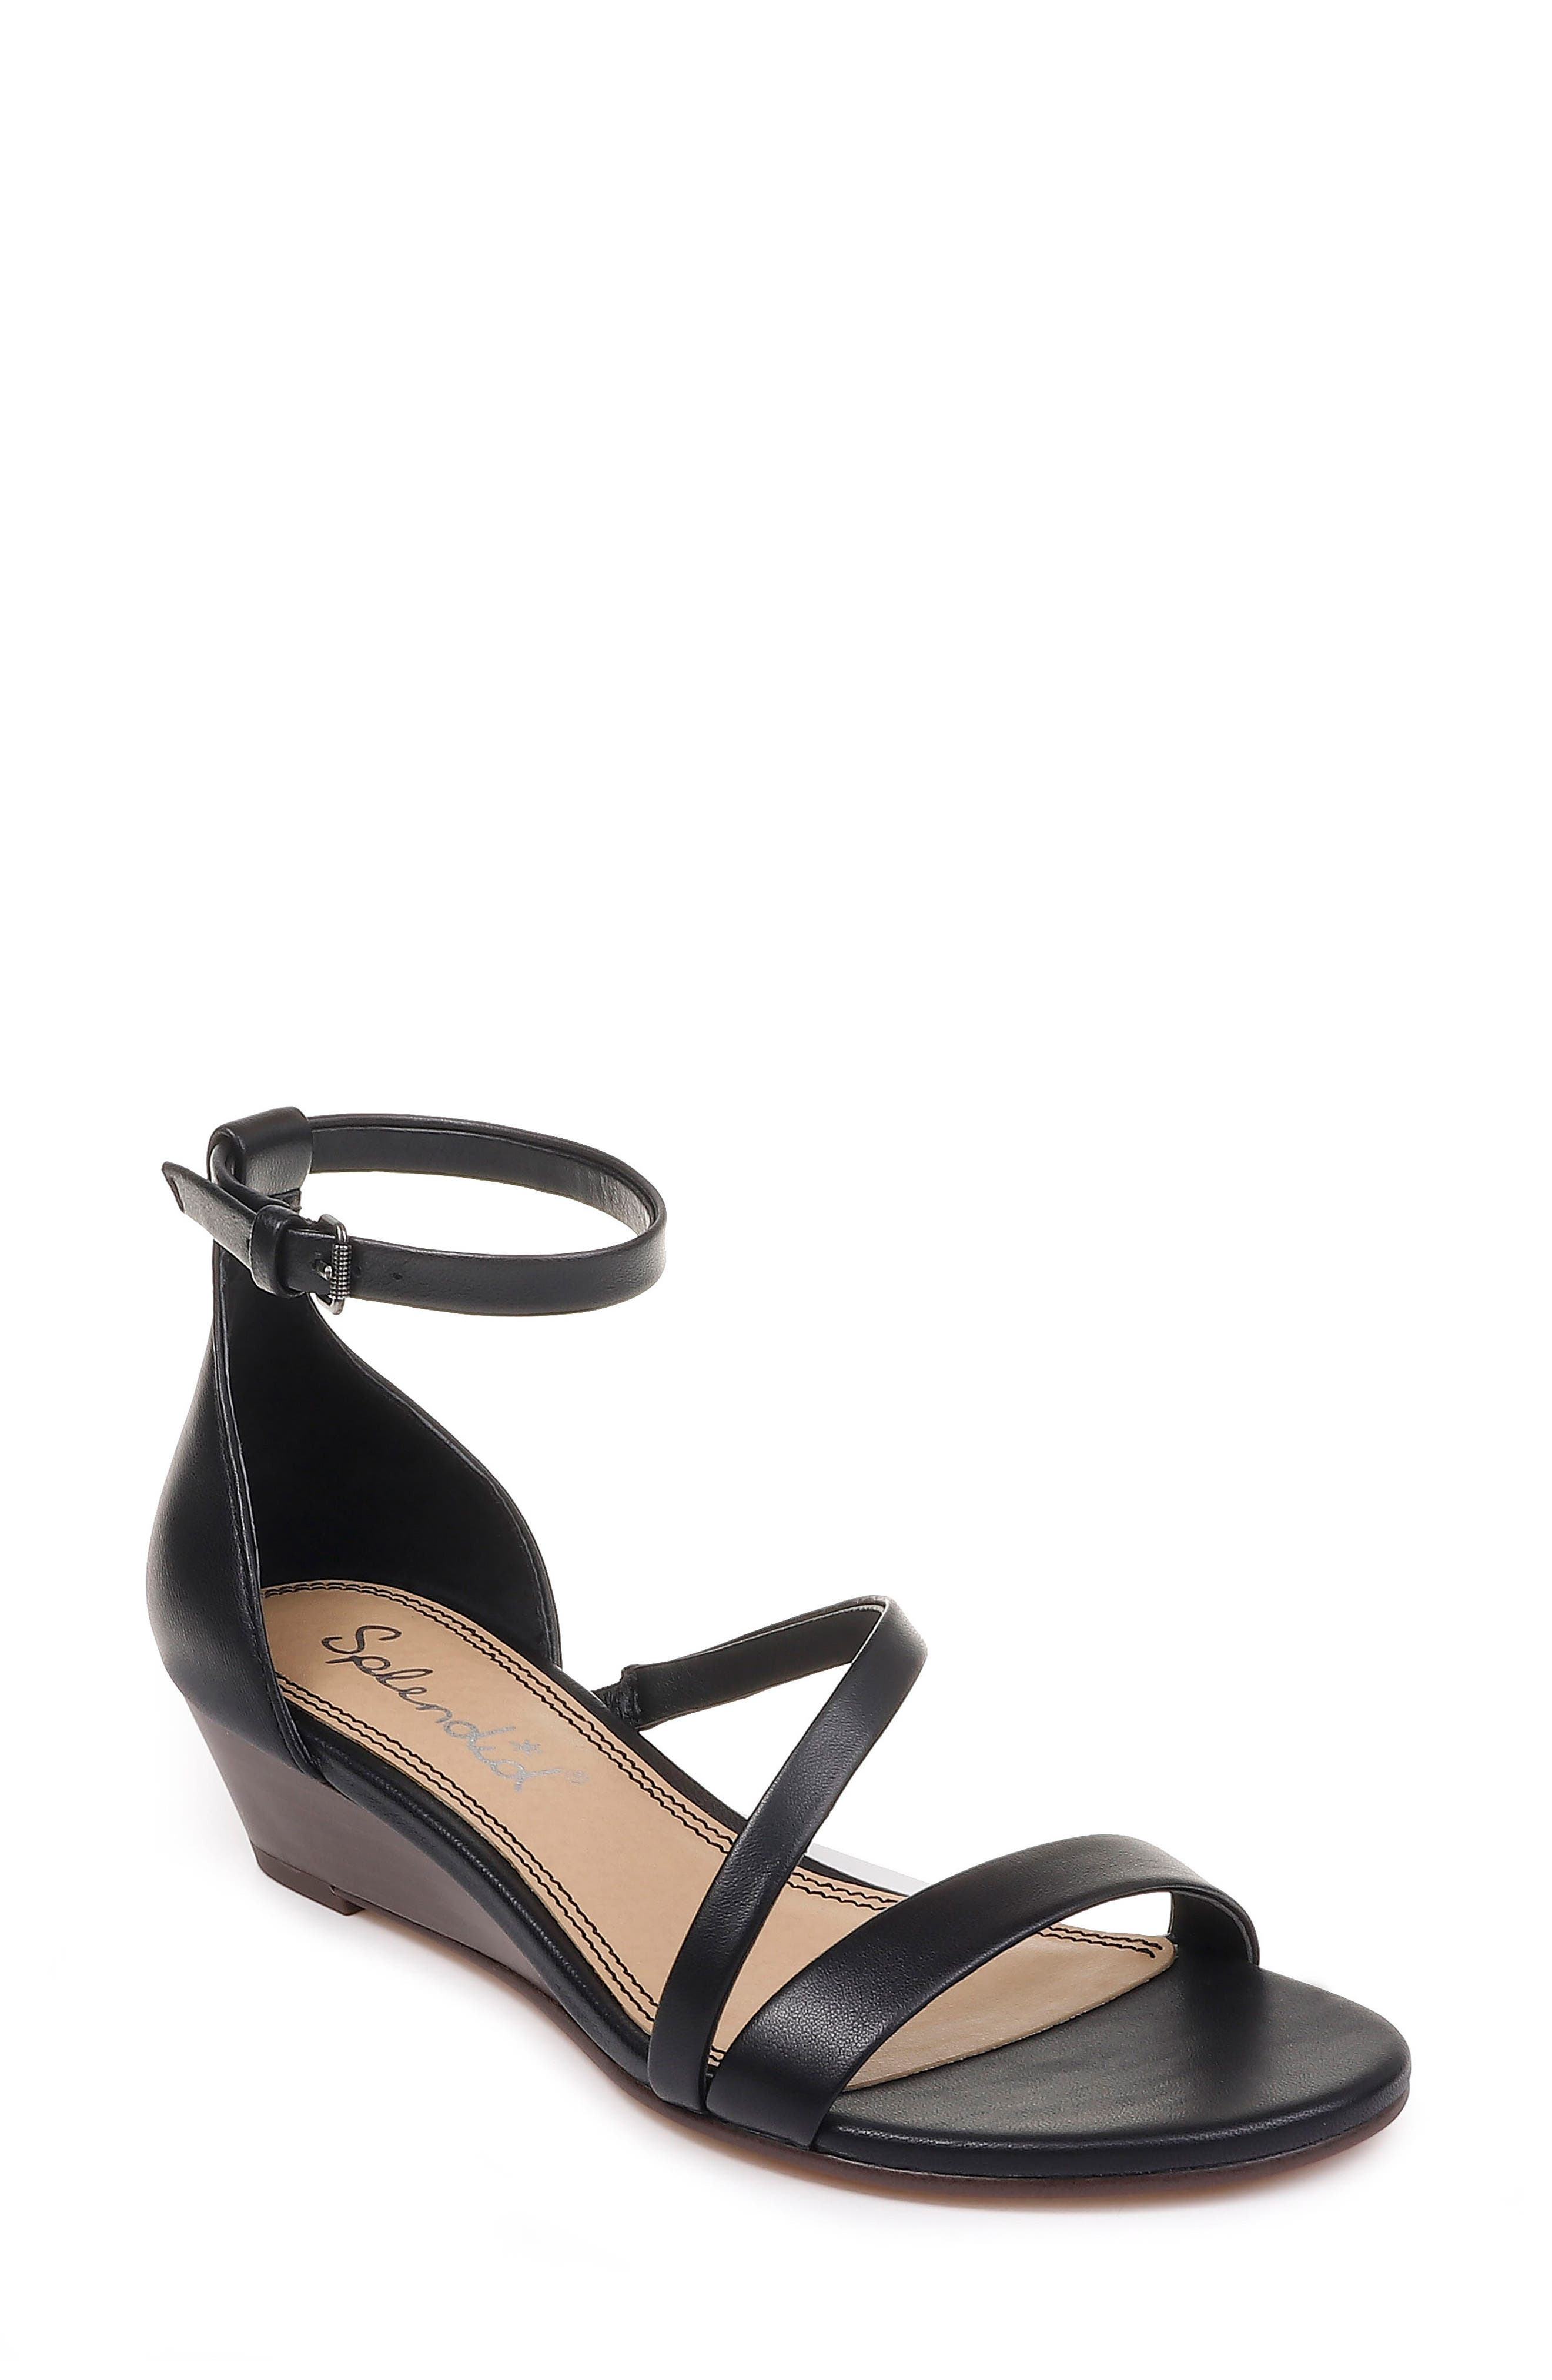 SPLENDID Stefano Strappy Wedge Sandal, Main, color, BLACK LEATHER